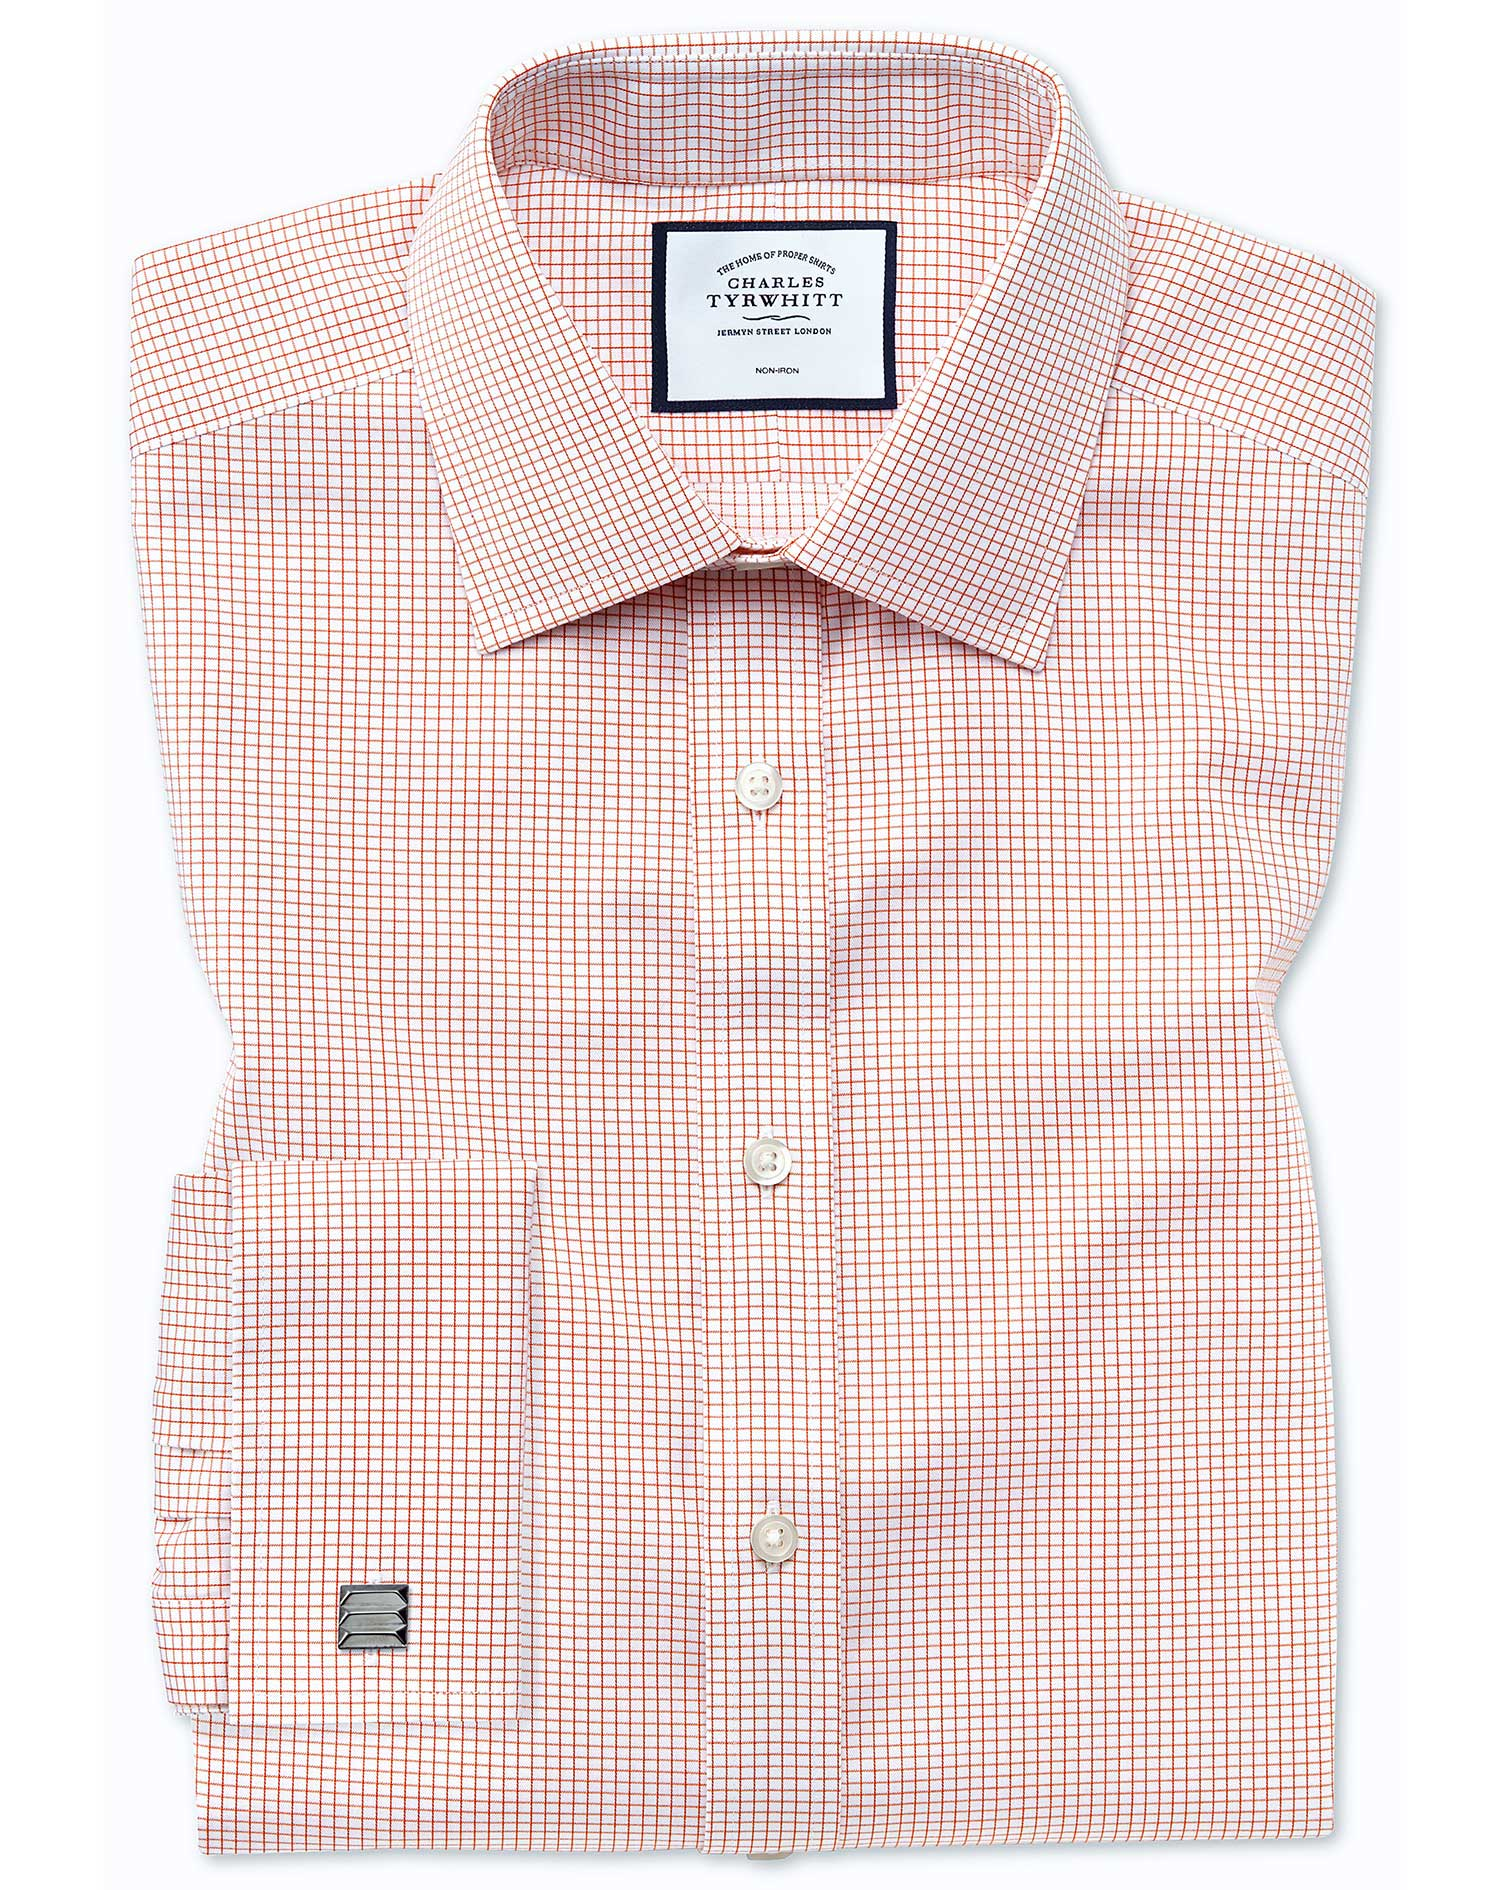 Classic Fit Non-Iron Twill Mini Grid Check Orange Cotton Formal Shirt Single Cuff Size 16/34 by Char